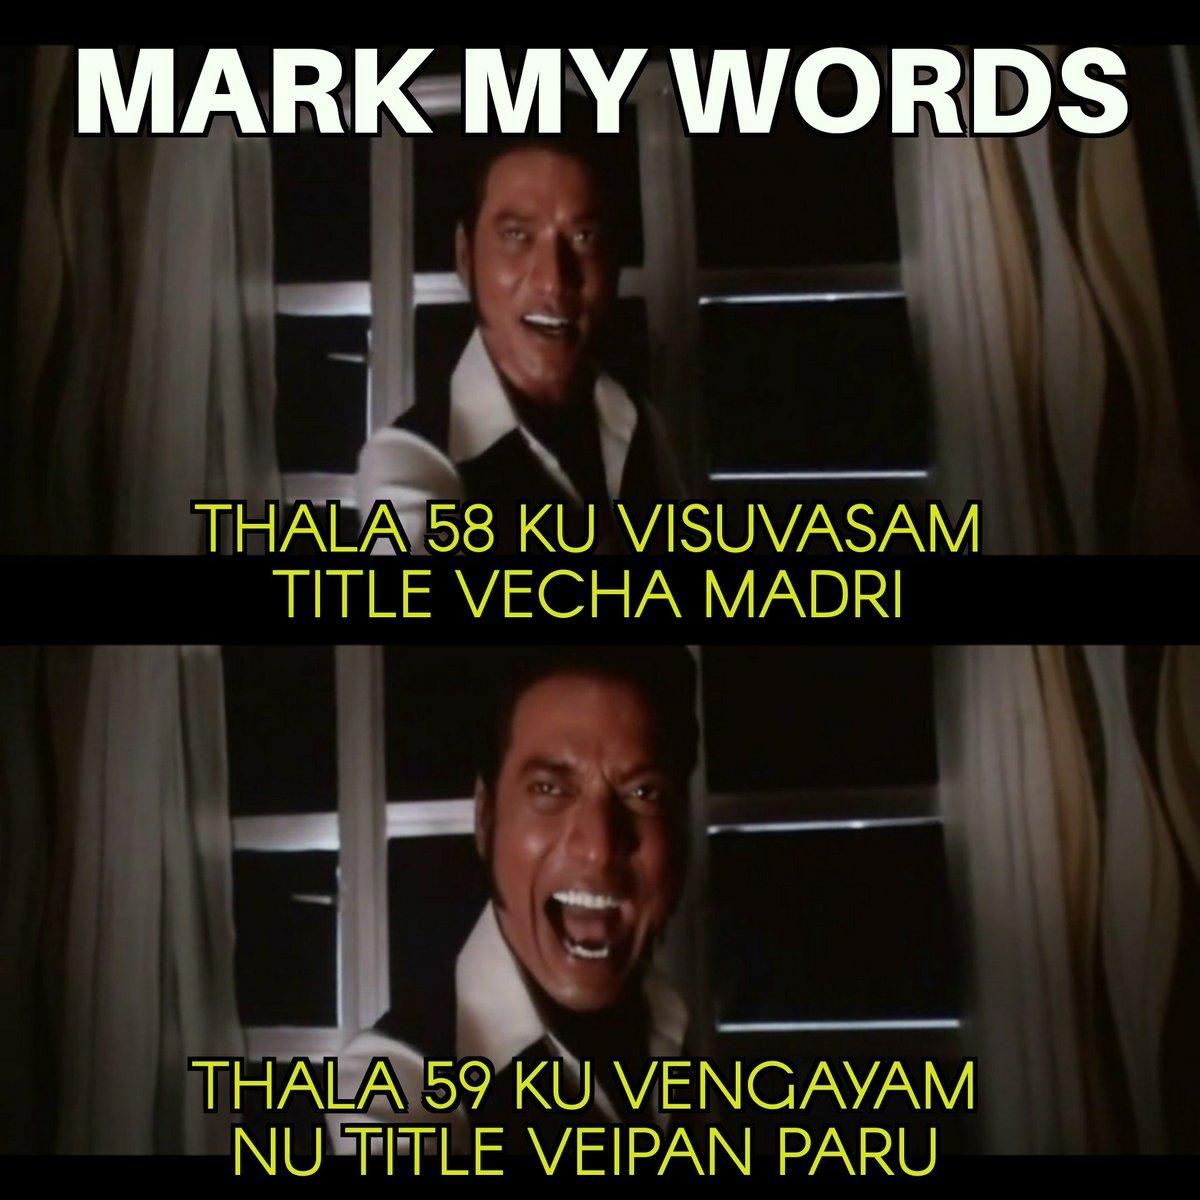 #Viswasam